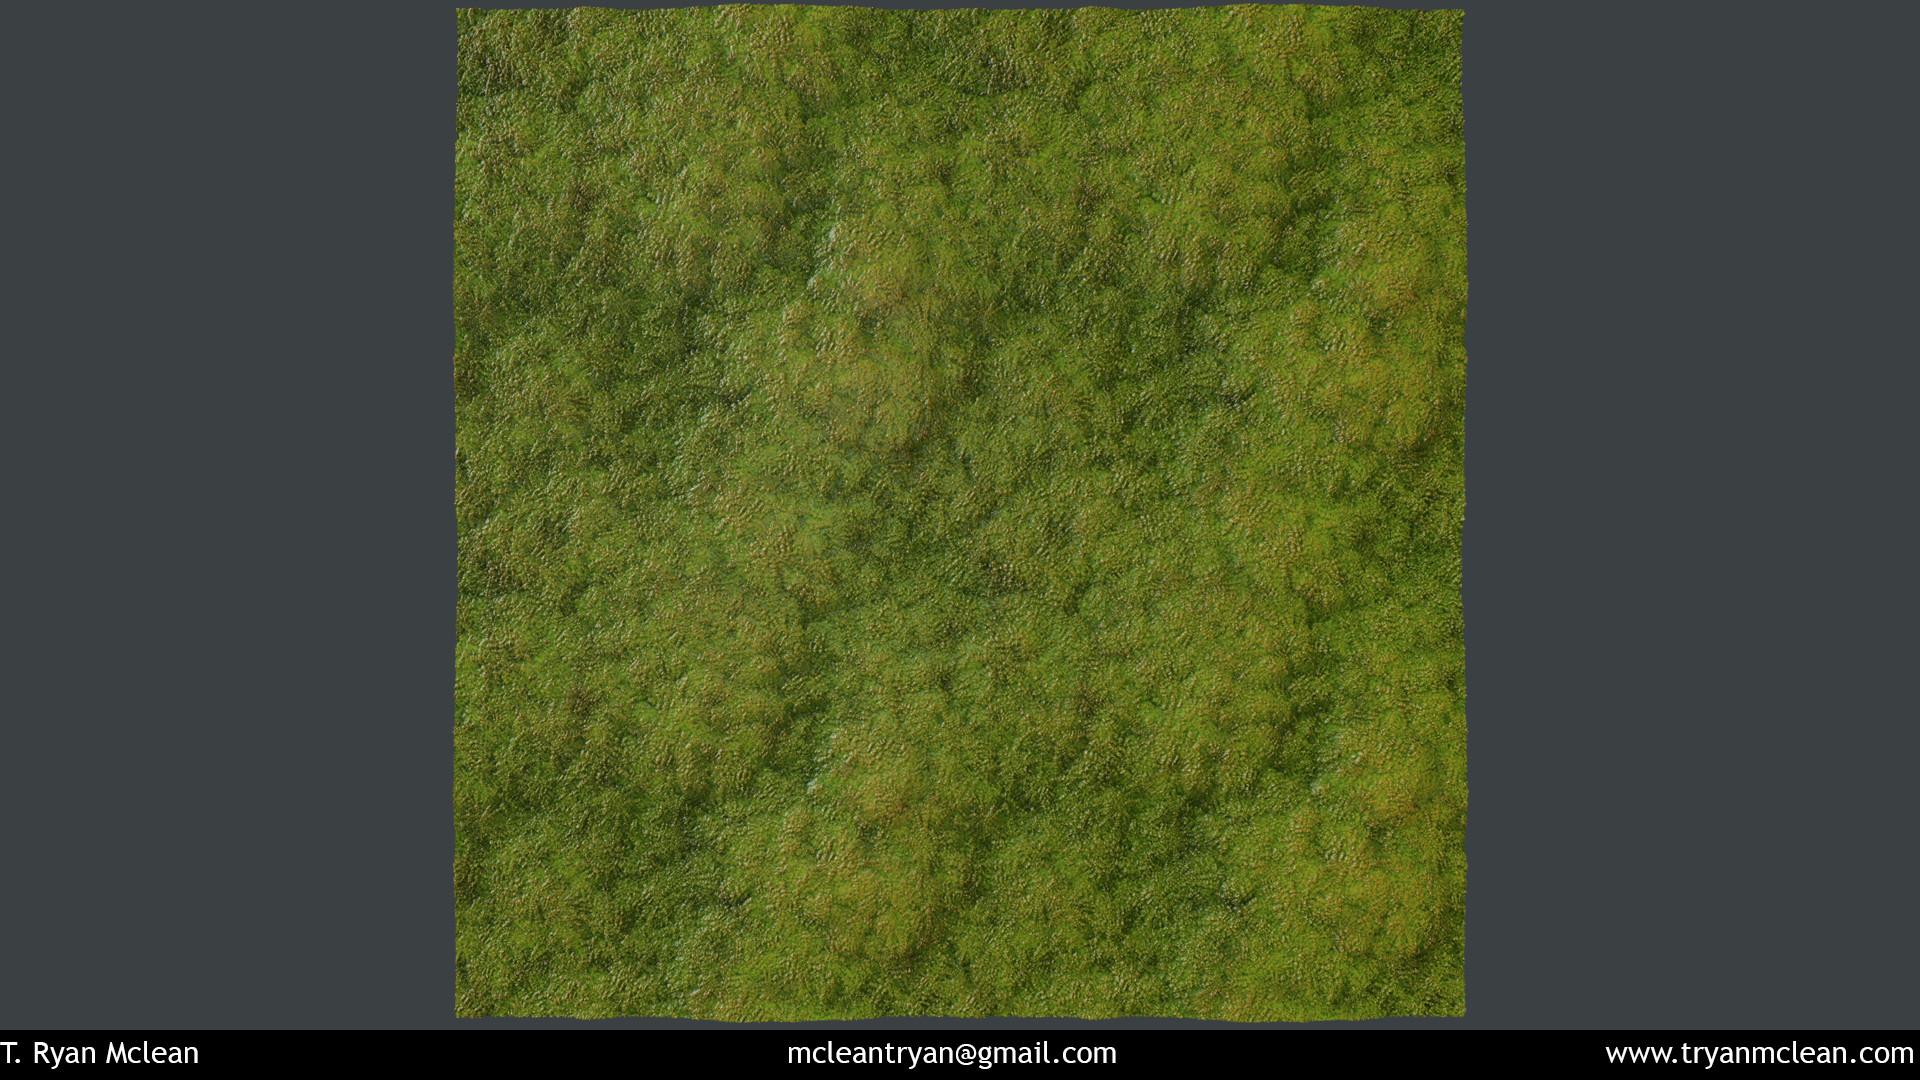 T ryan mclean moss 02